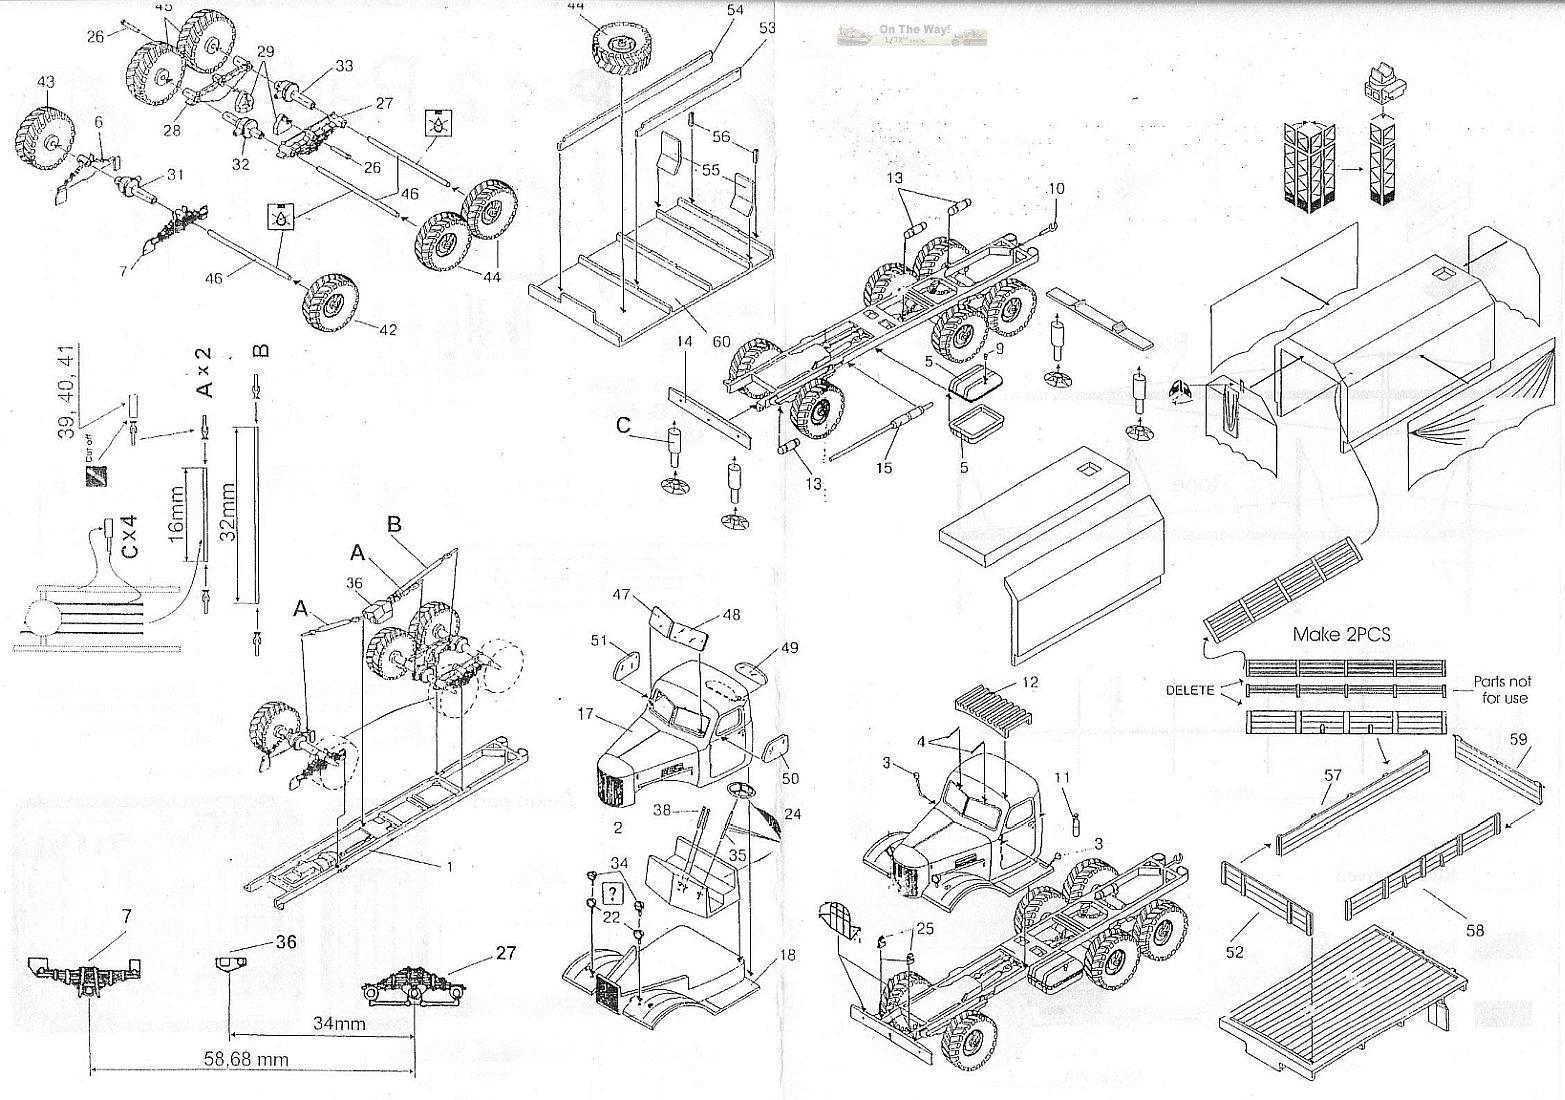 Zz Exclusive Modell P 12 Radar Kit No